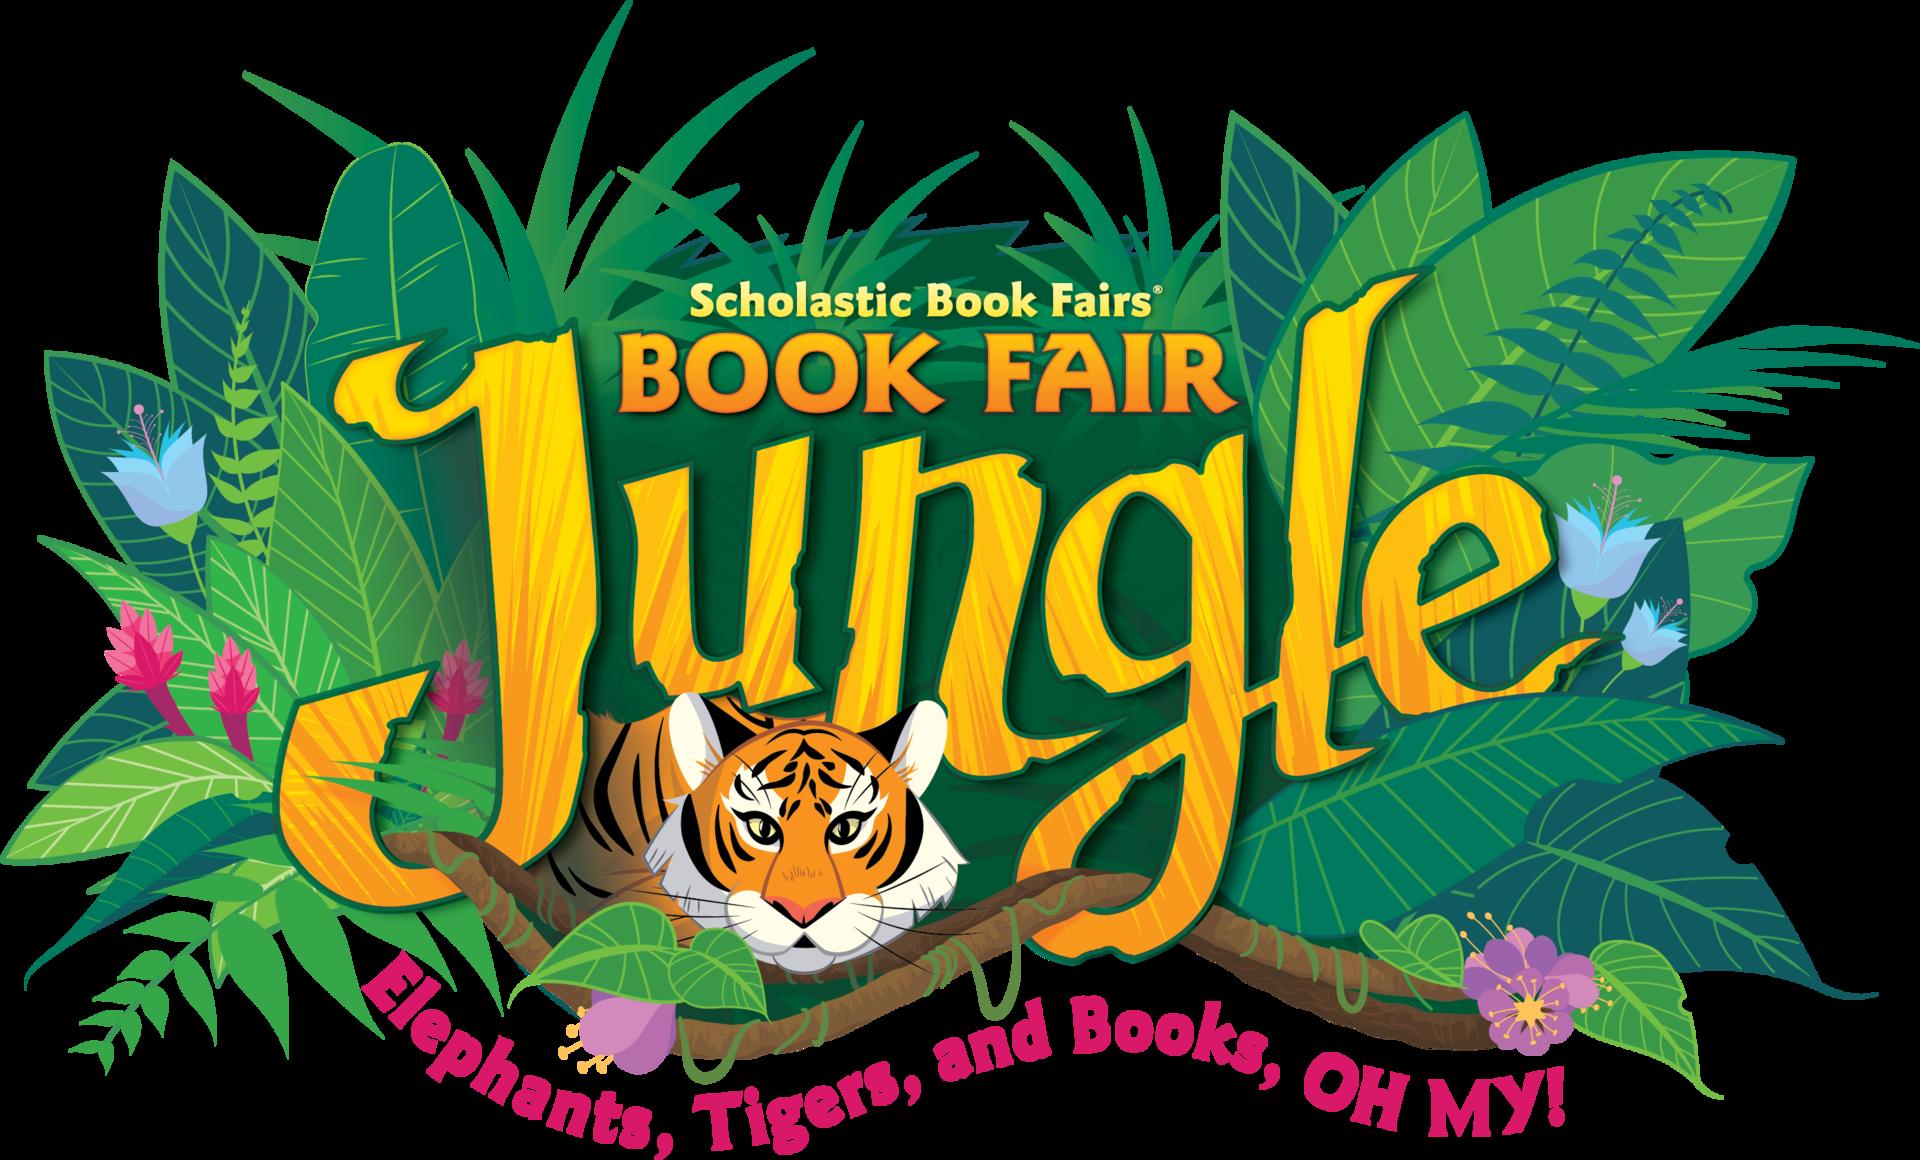 Image of Fall Book Fair logo